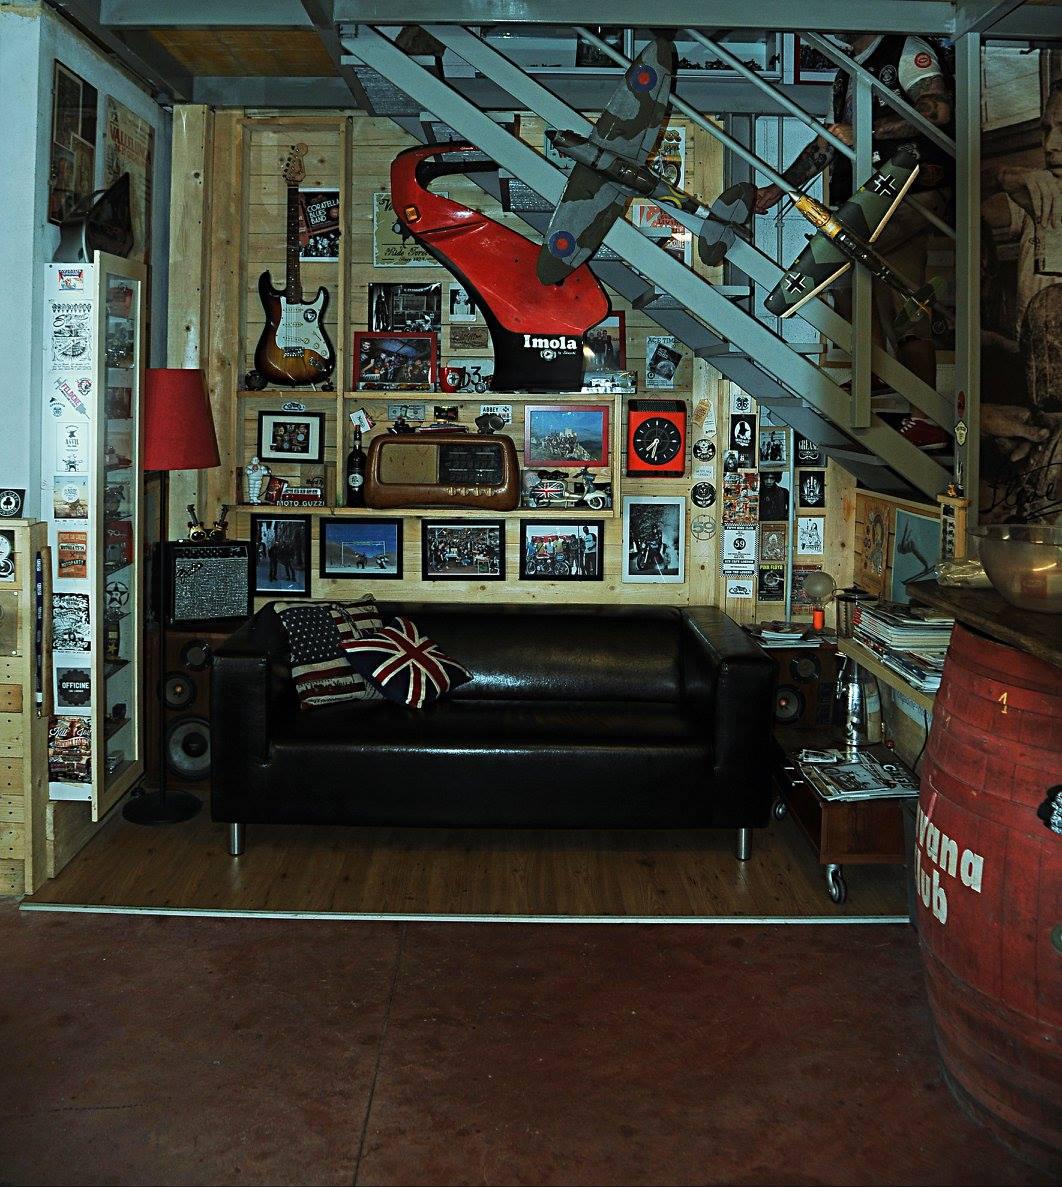 Man Cave Garage Magazine : Ciborio s man cave rocketgarage cafe racer magazine